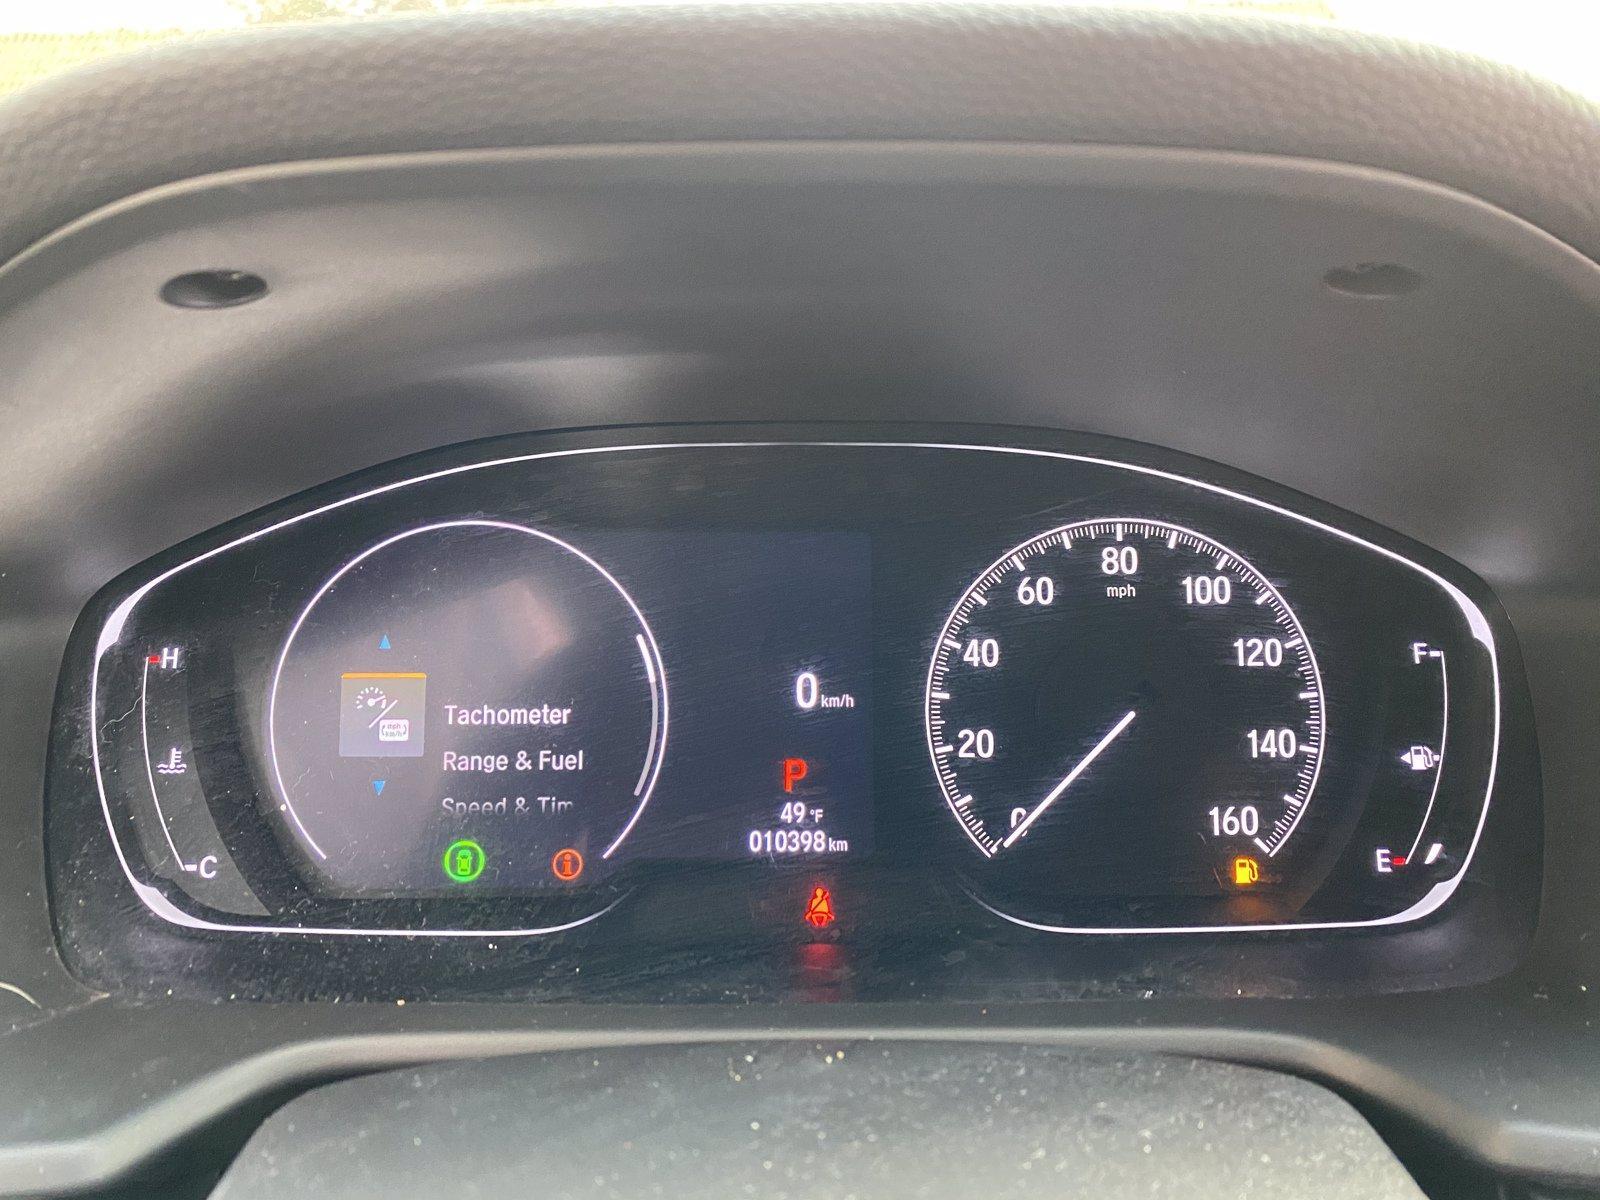 Used-2019-Honda-Accord-Sedan-Sport-15T-(RED-INTERIOR)